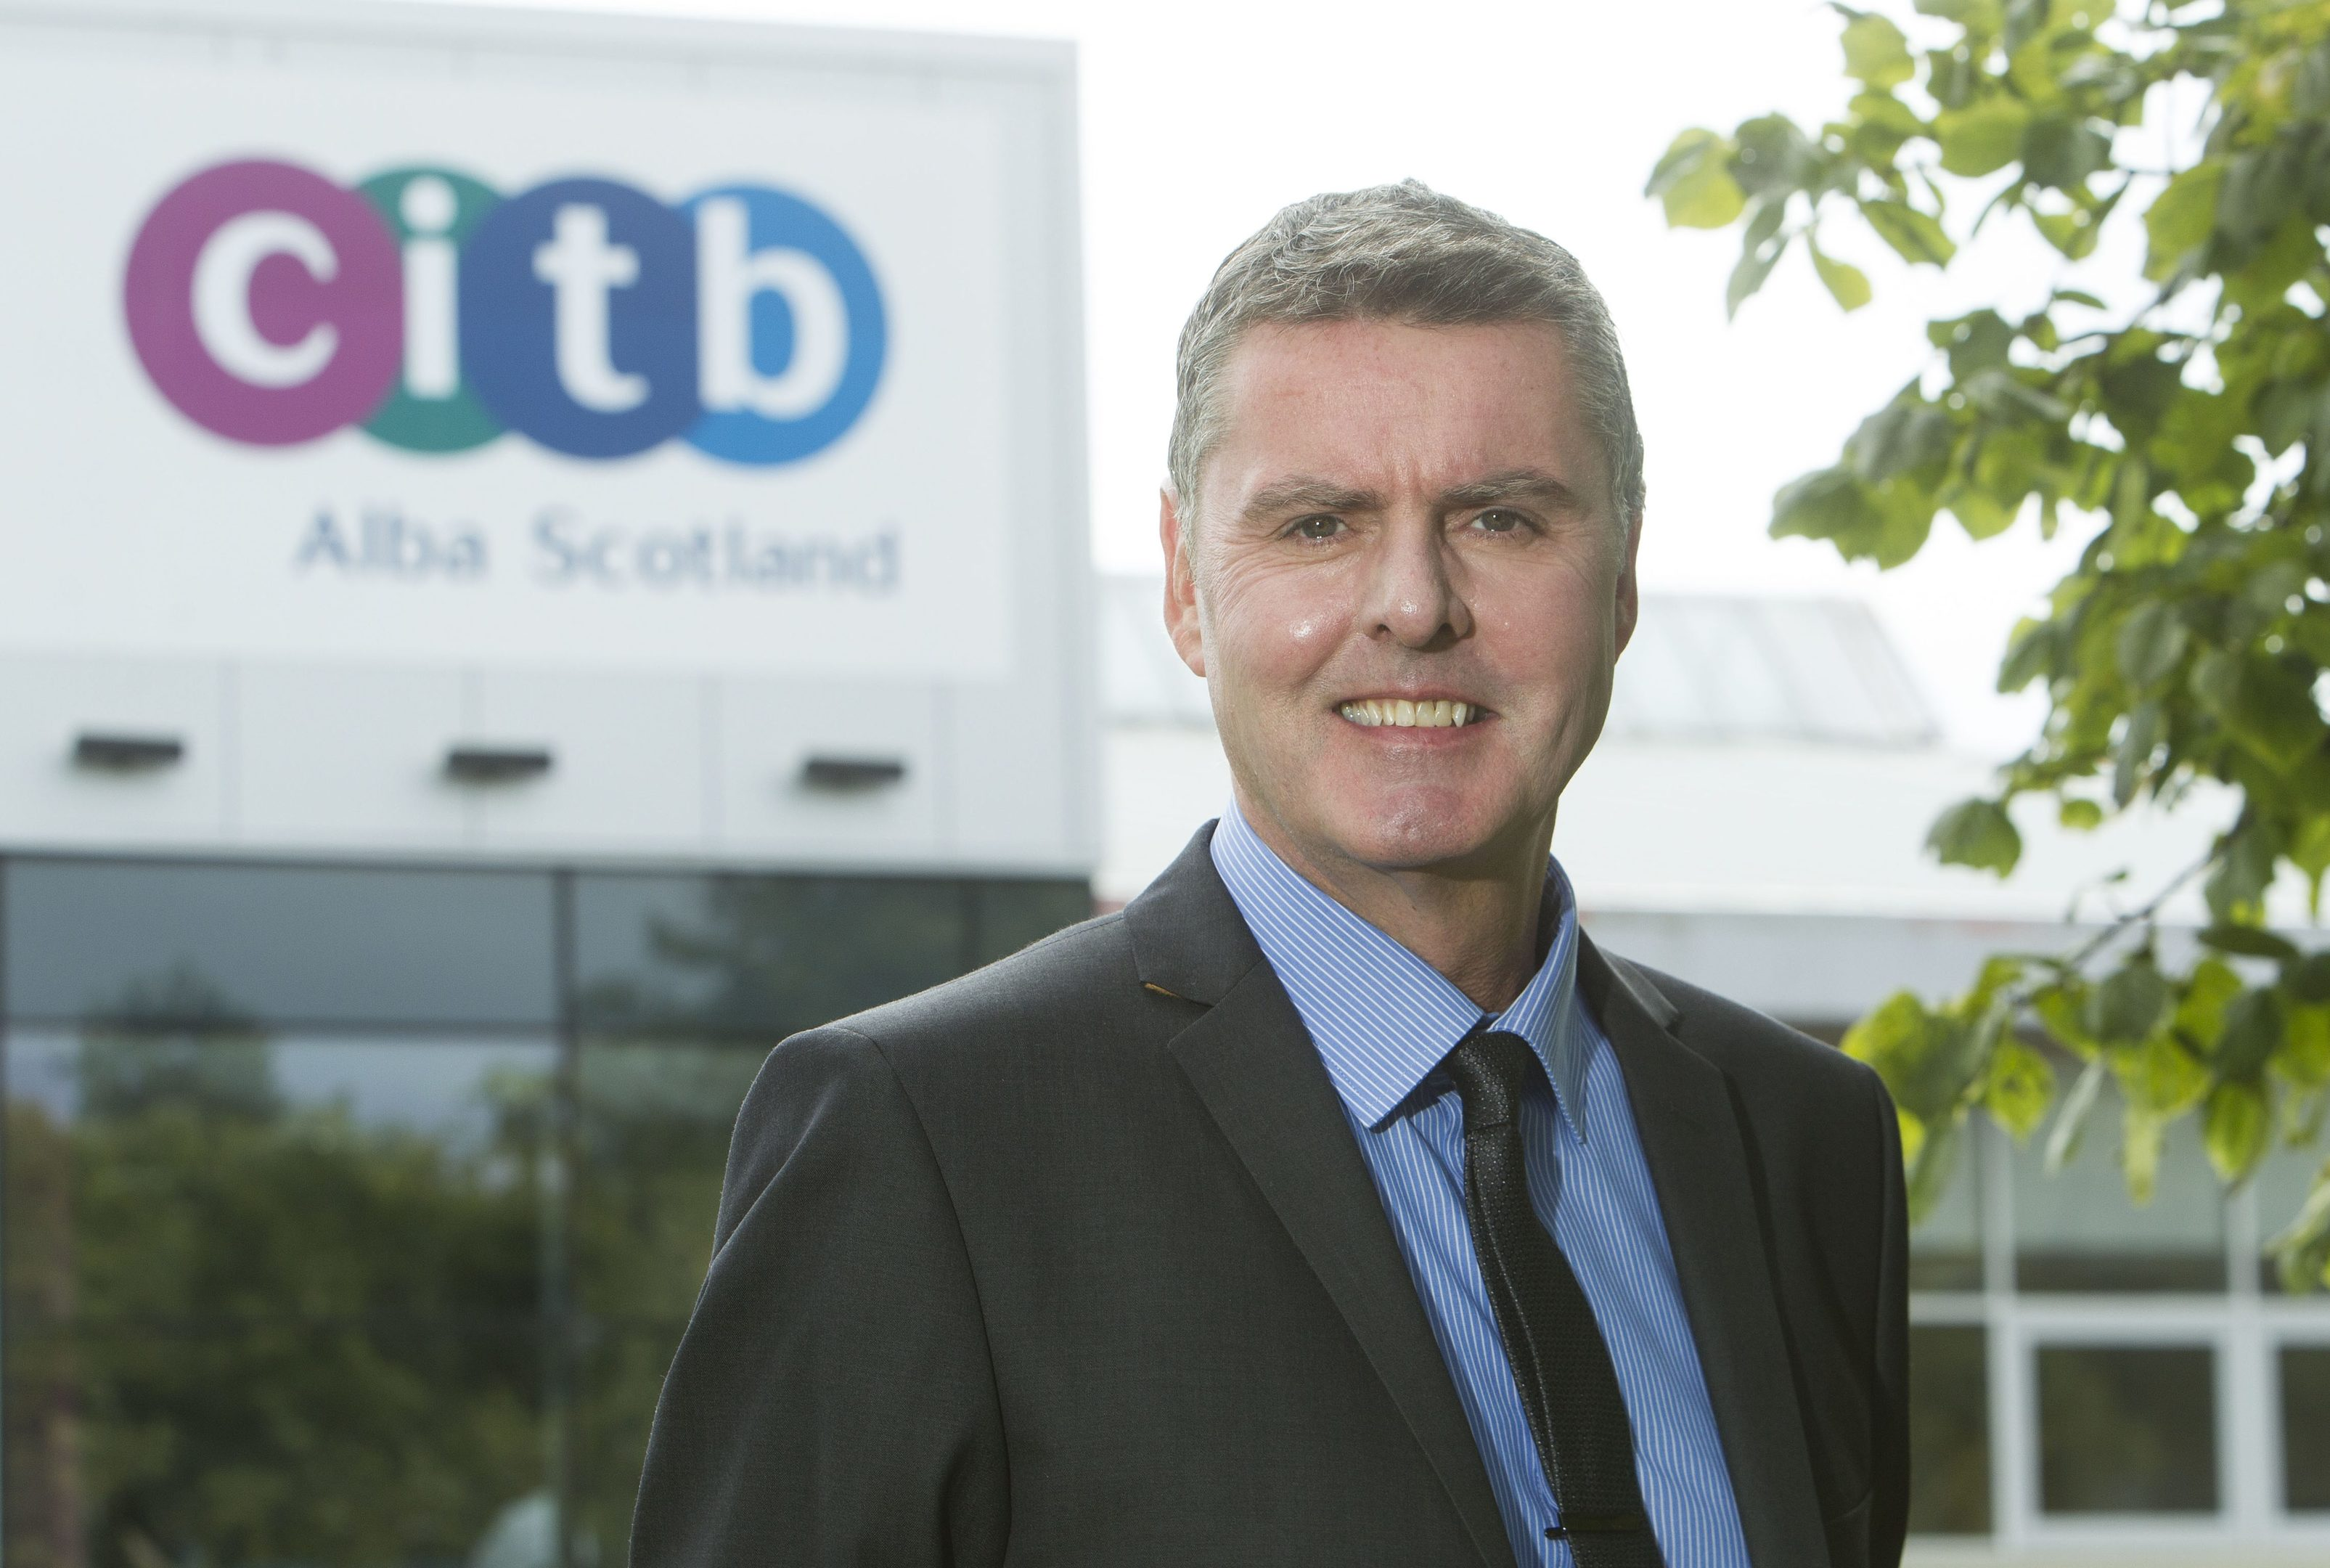 Ian Hughes, CITB director